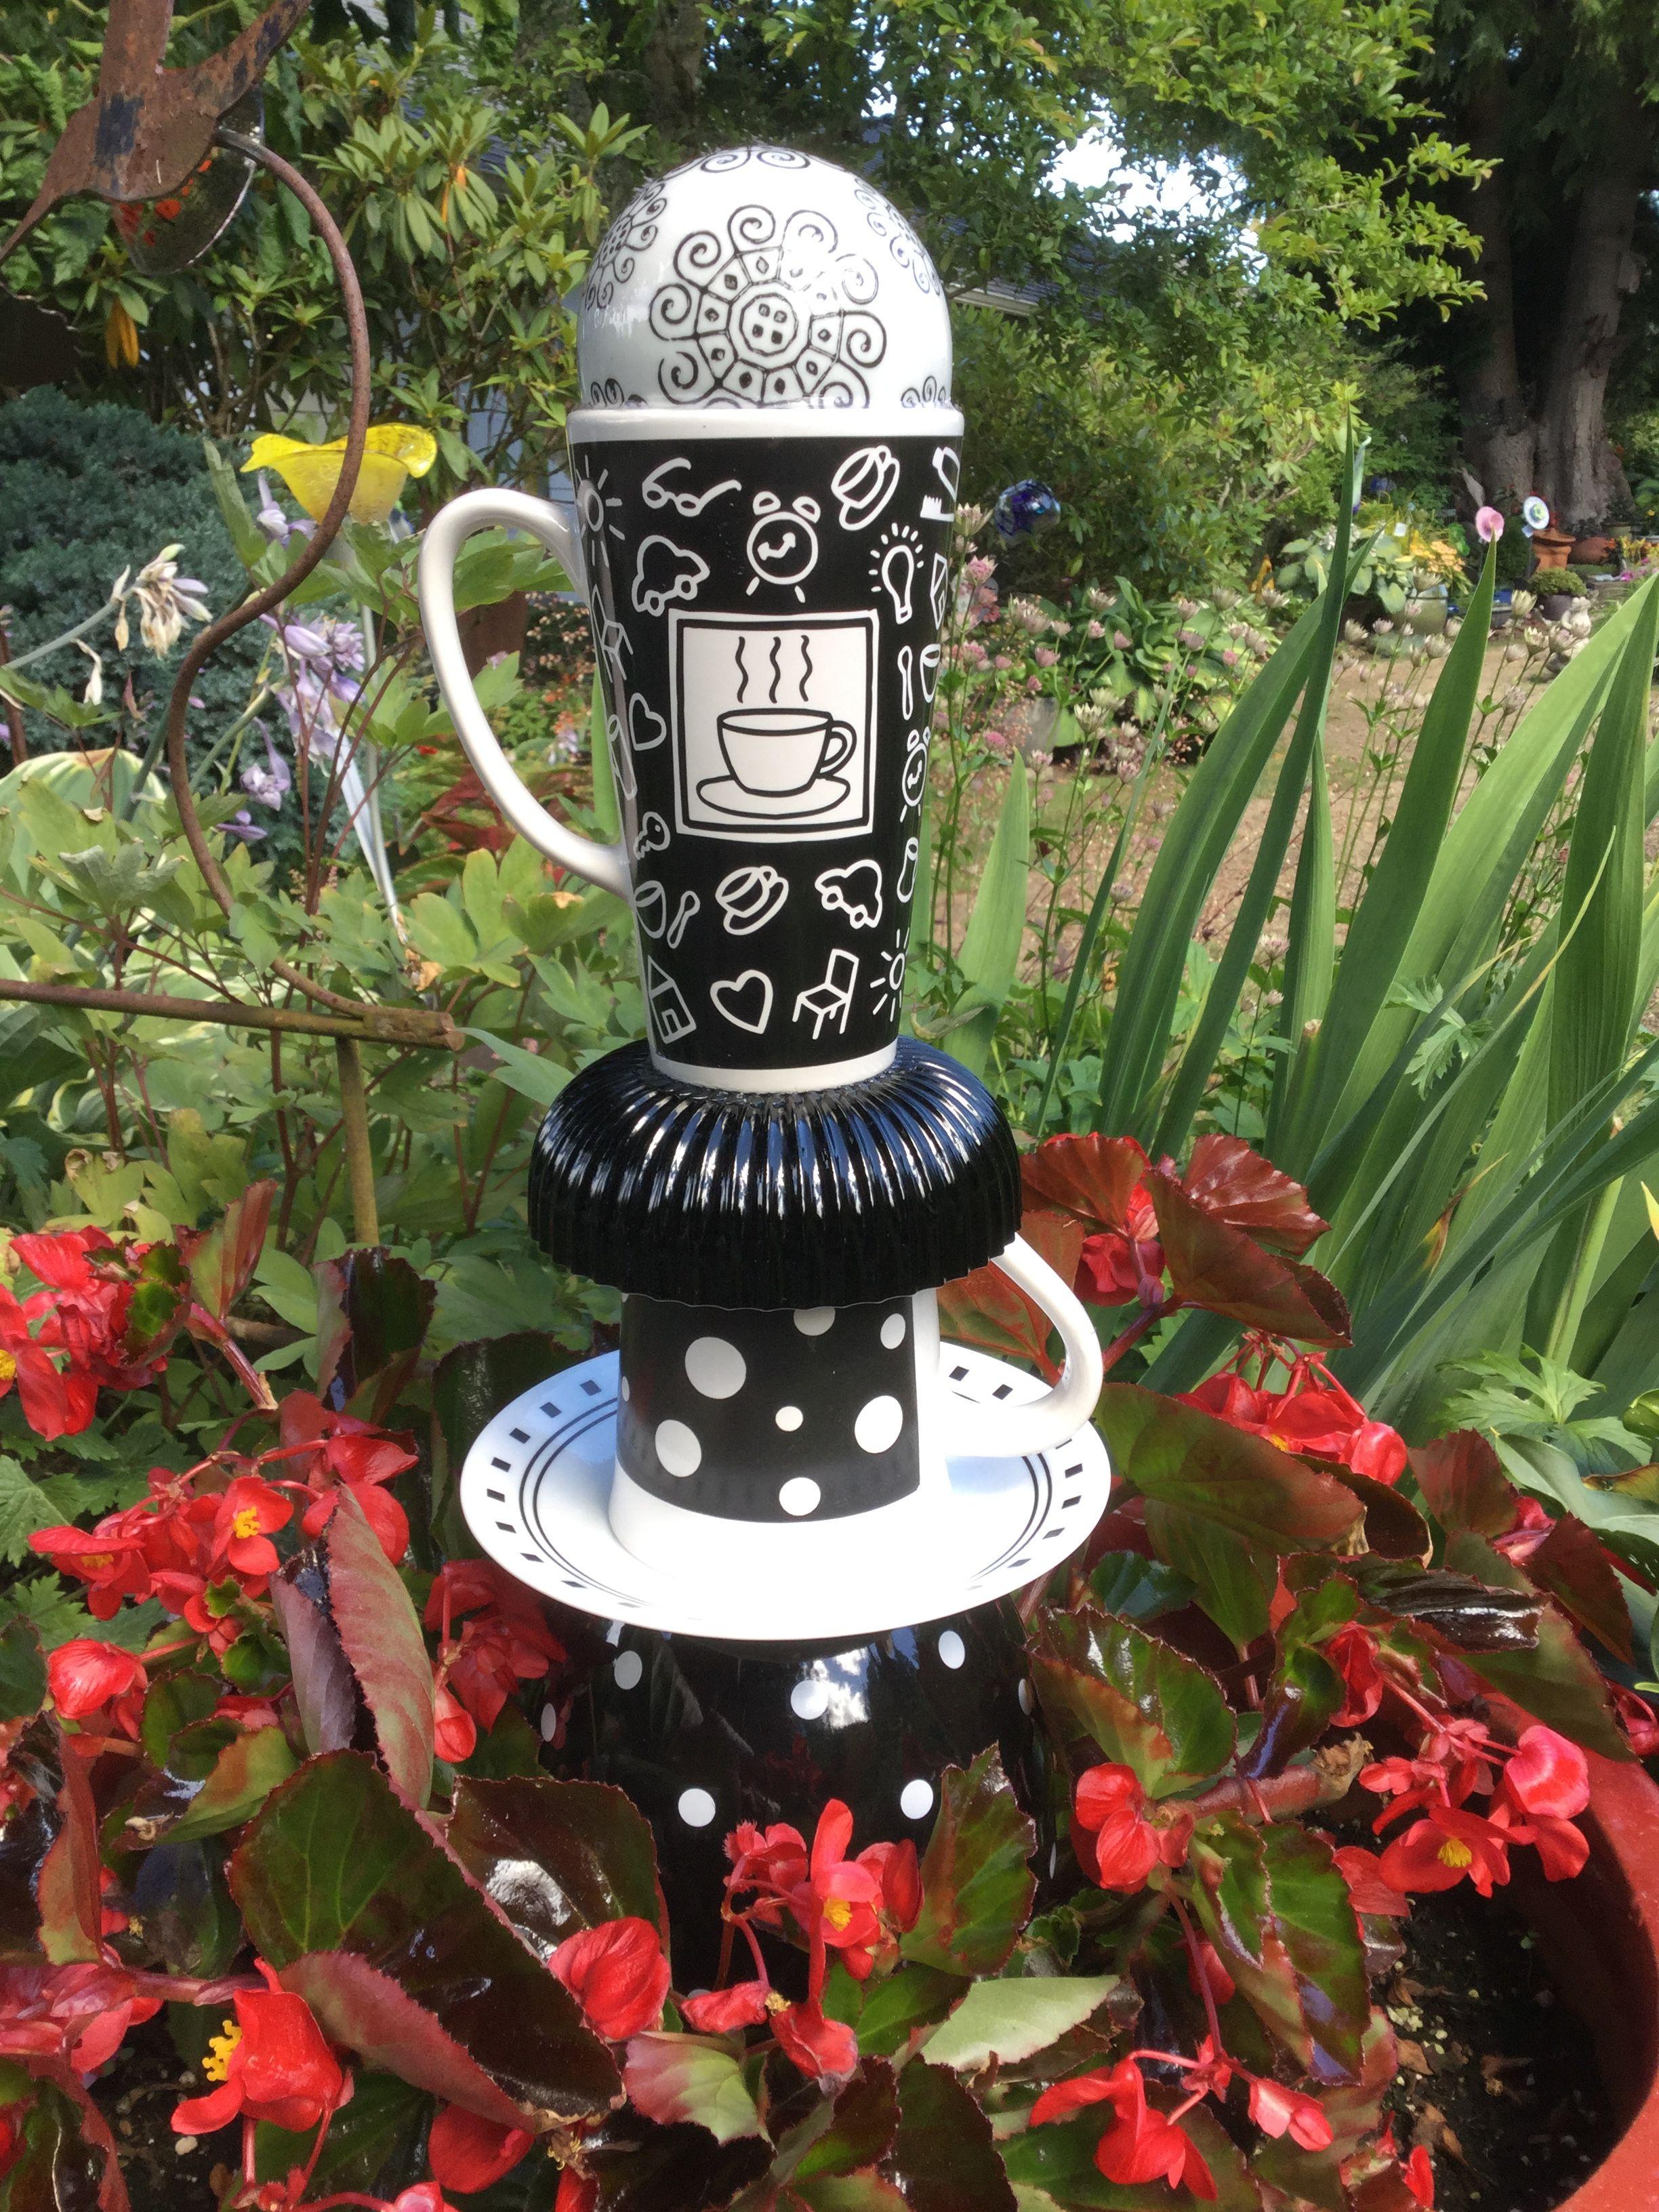 Glass yard art  Pin by Linda Cowan on My Glass Garden Creations  Pinterest  Diy